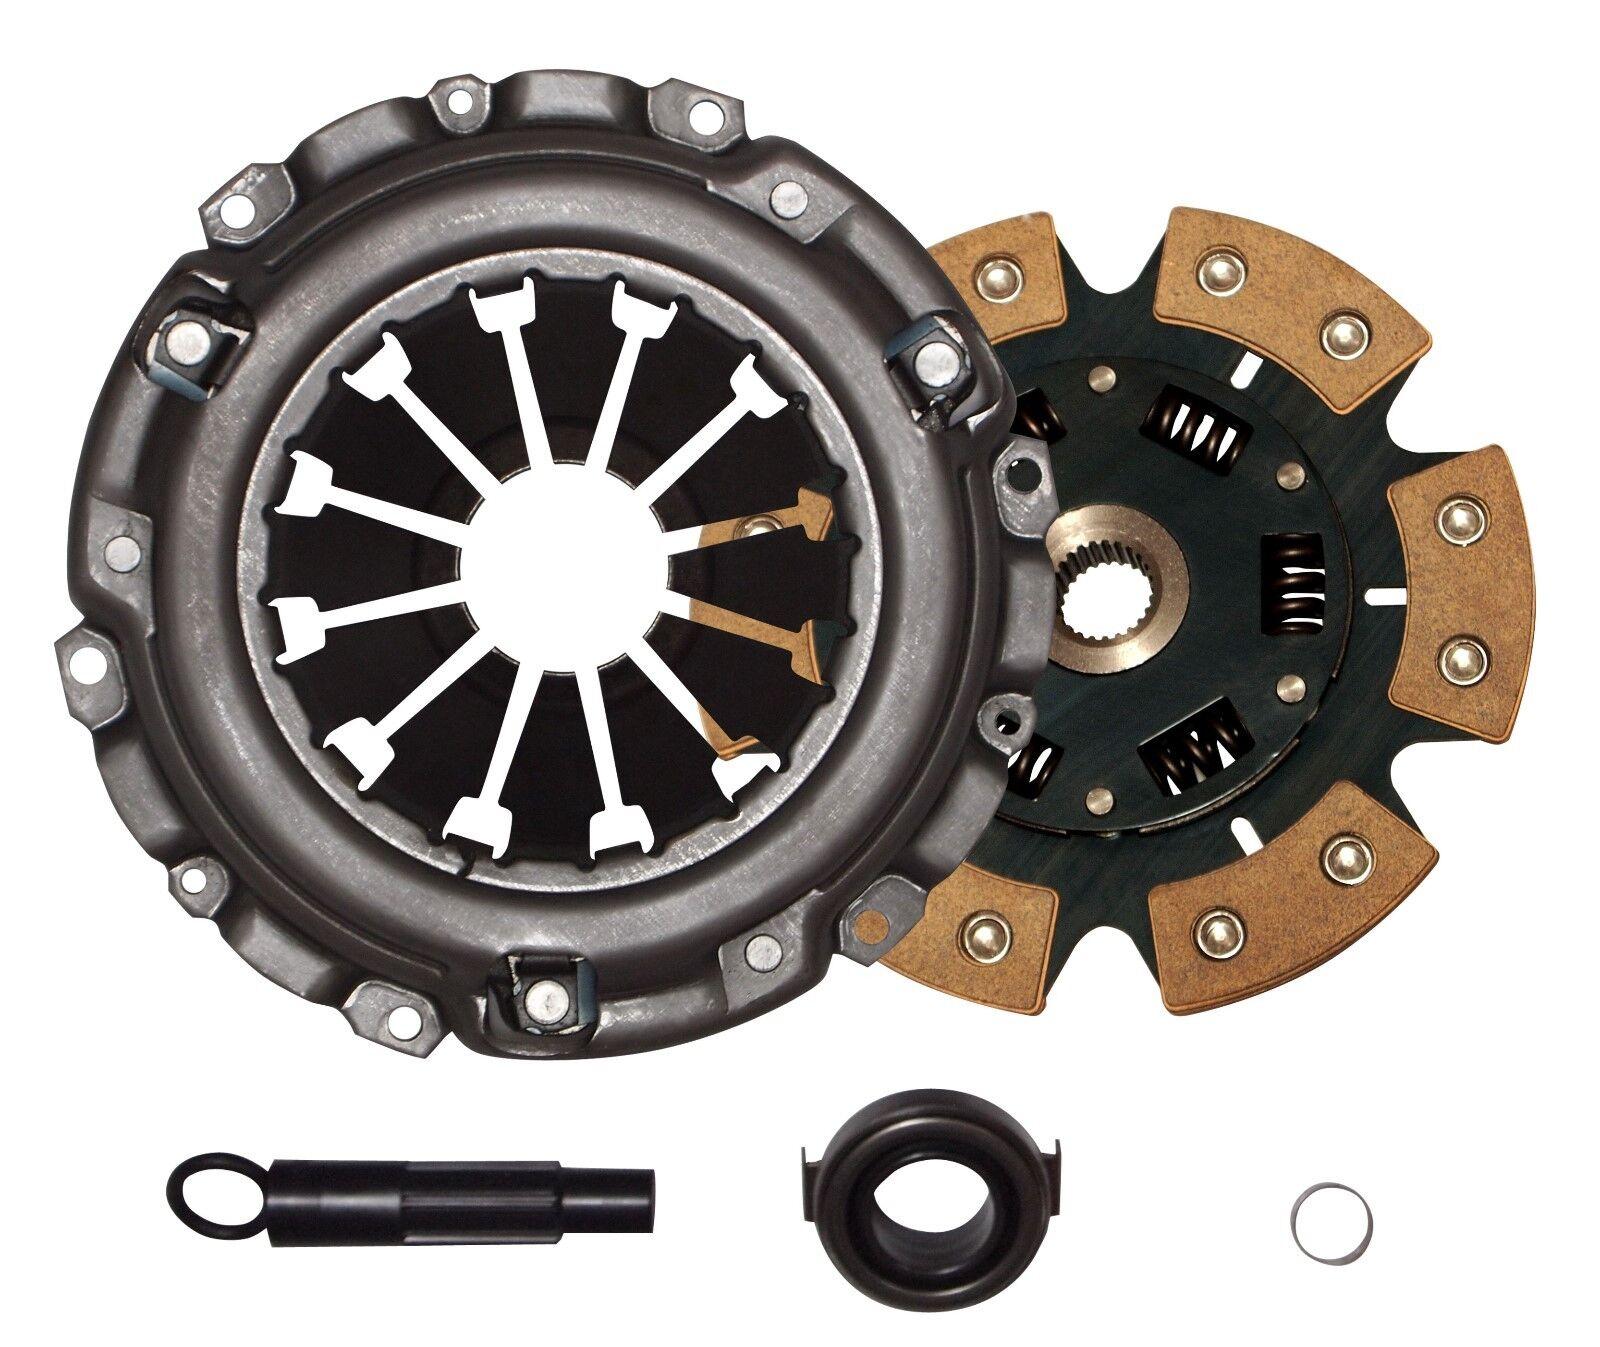 Porsche Boxster Engine Rattle: QSC Stage 3 Clutch Kit RSX Type-S Civic Si K20 2.0L IVTEC